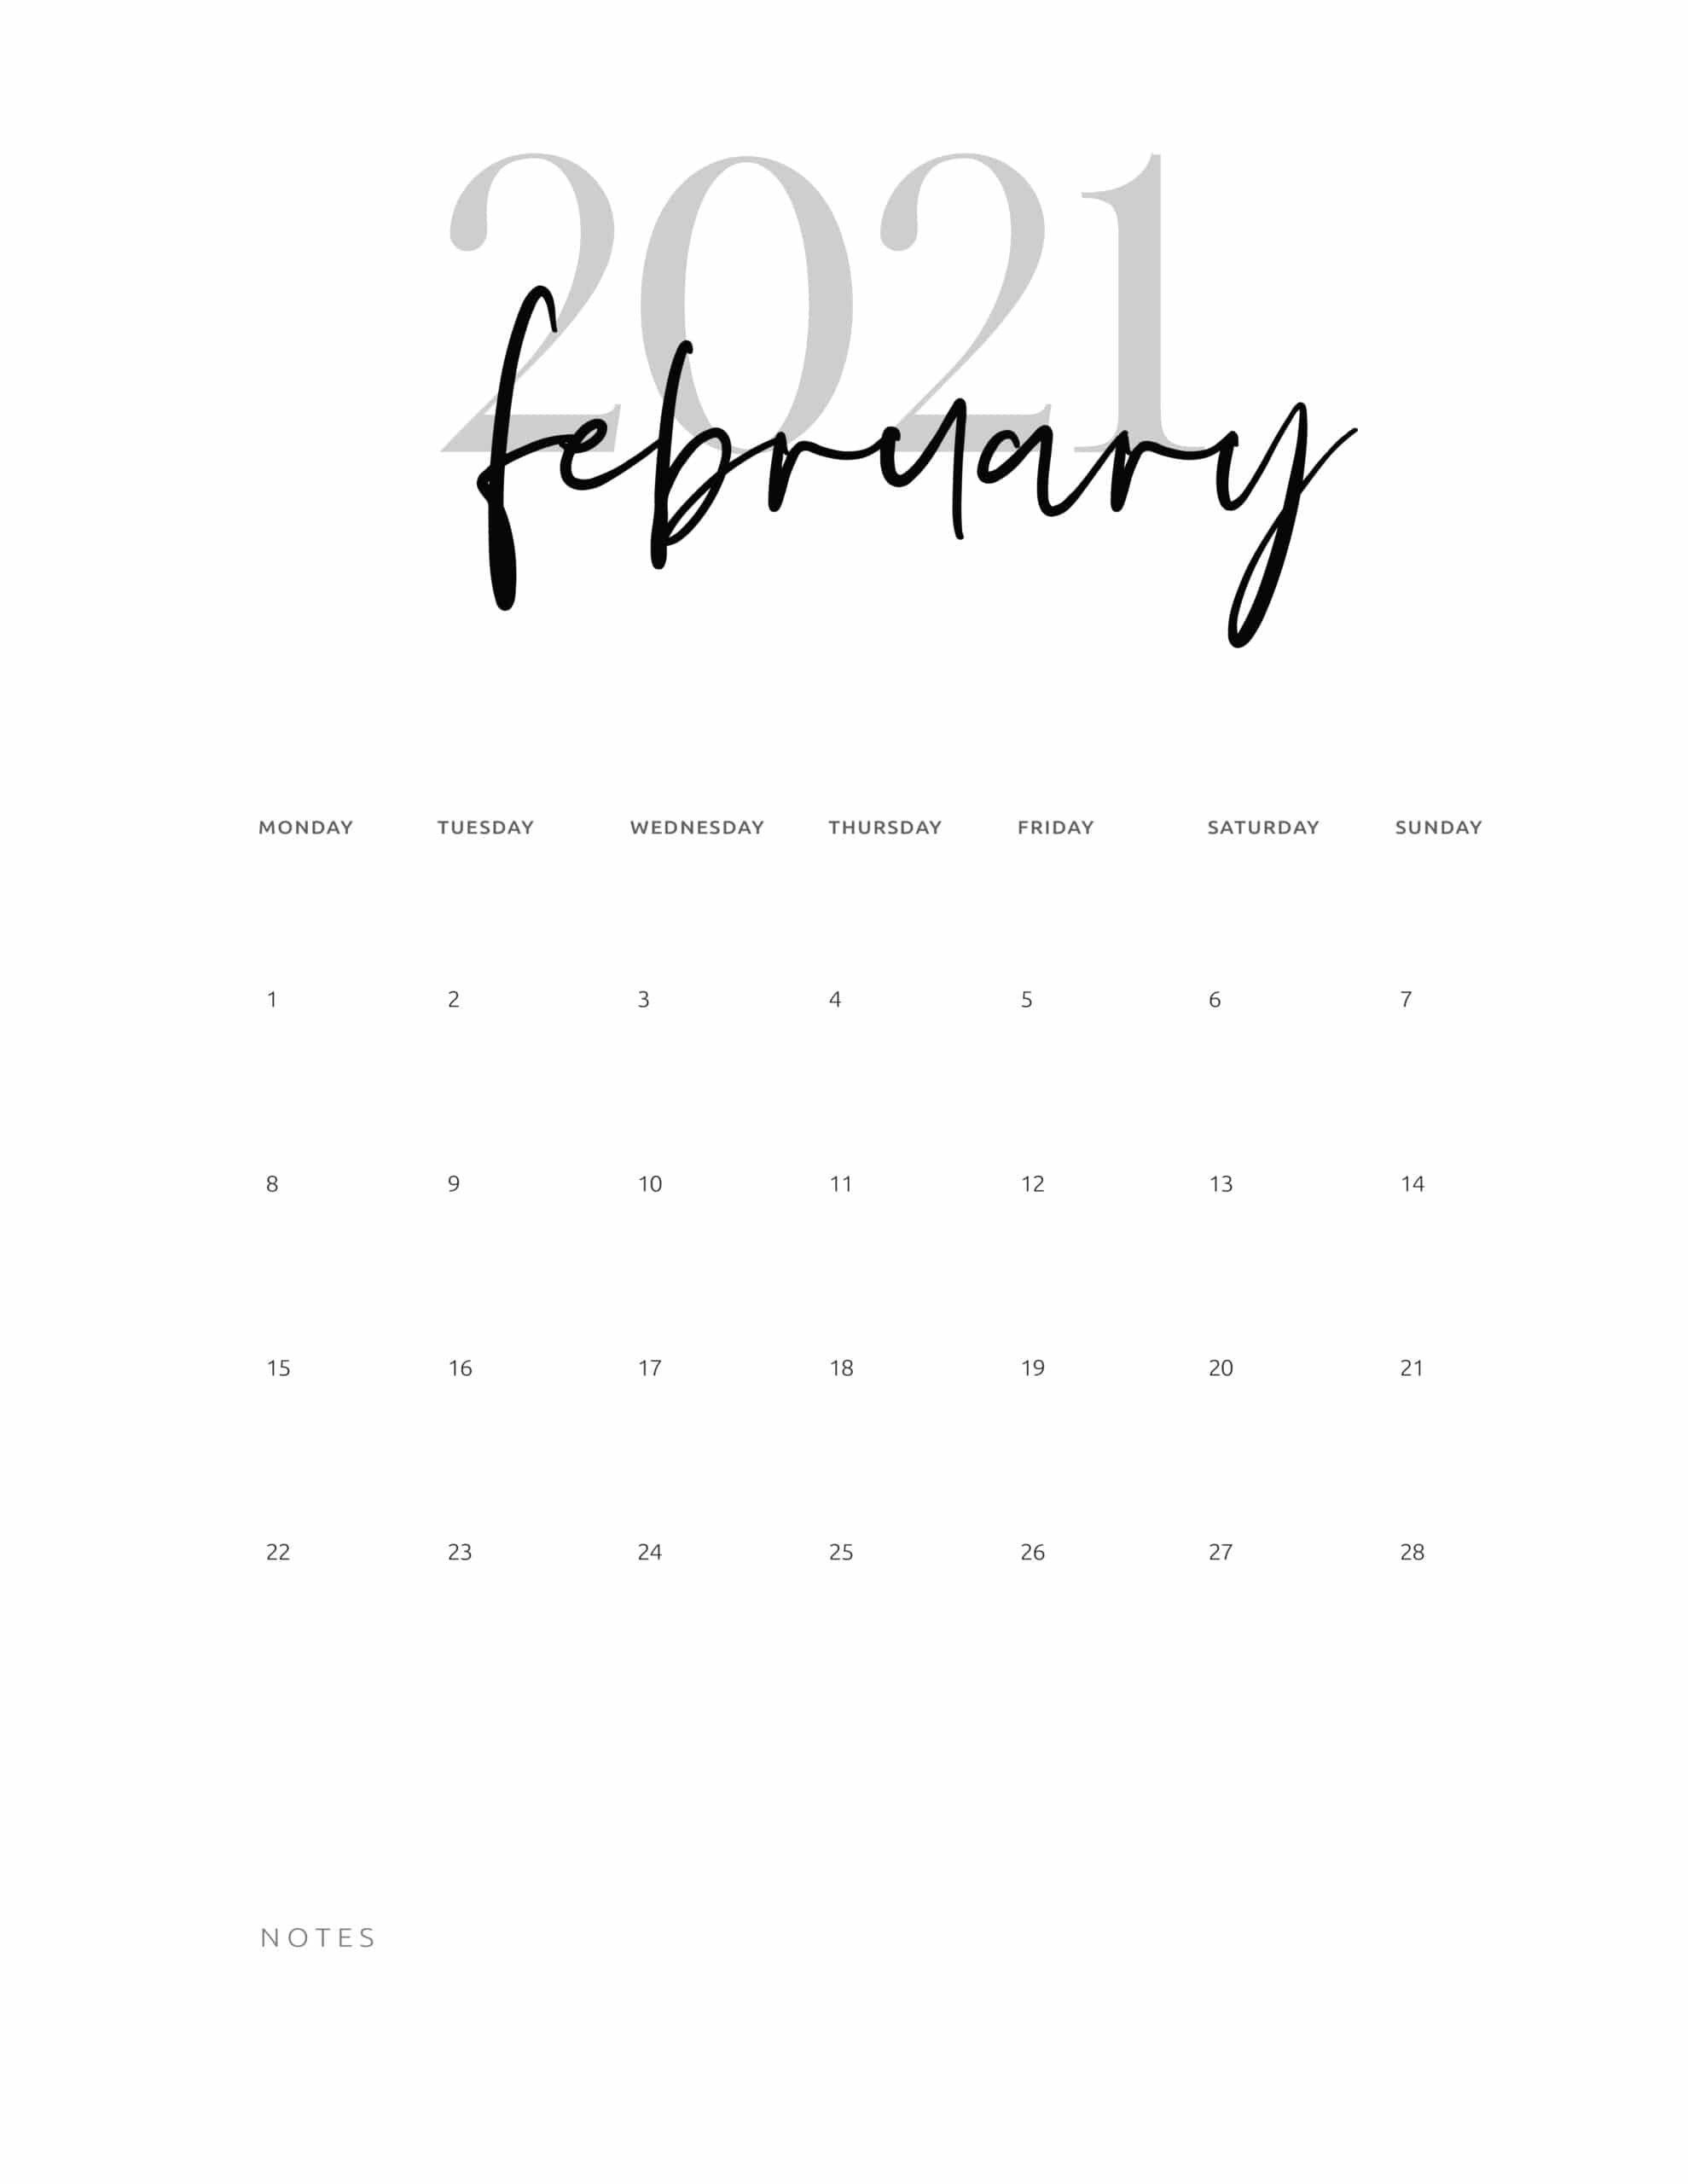 2021 Calendar Printable Cursive - World Of Printables inside What Year Calendar Matches 2021